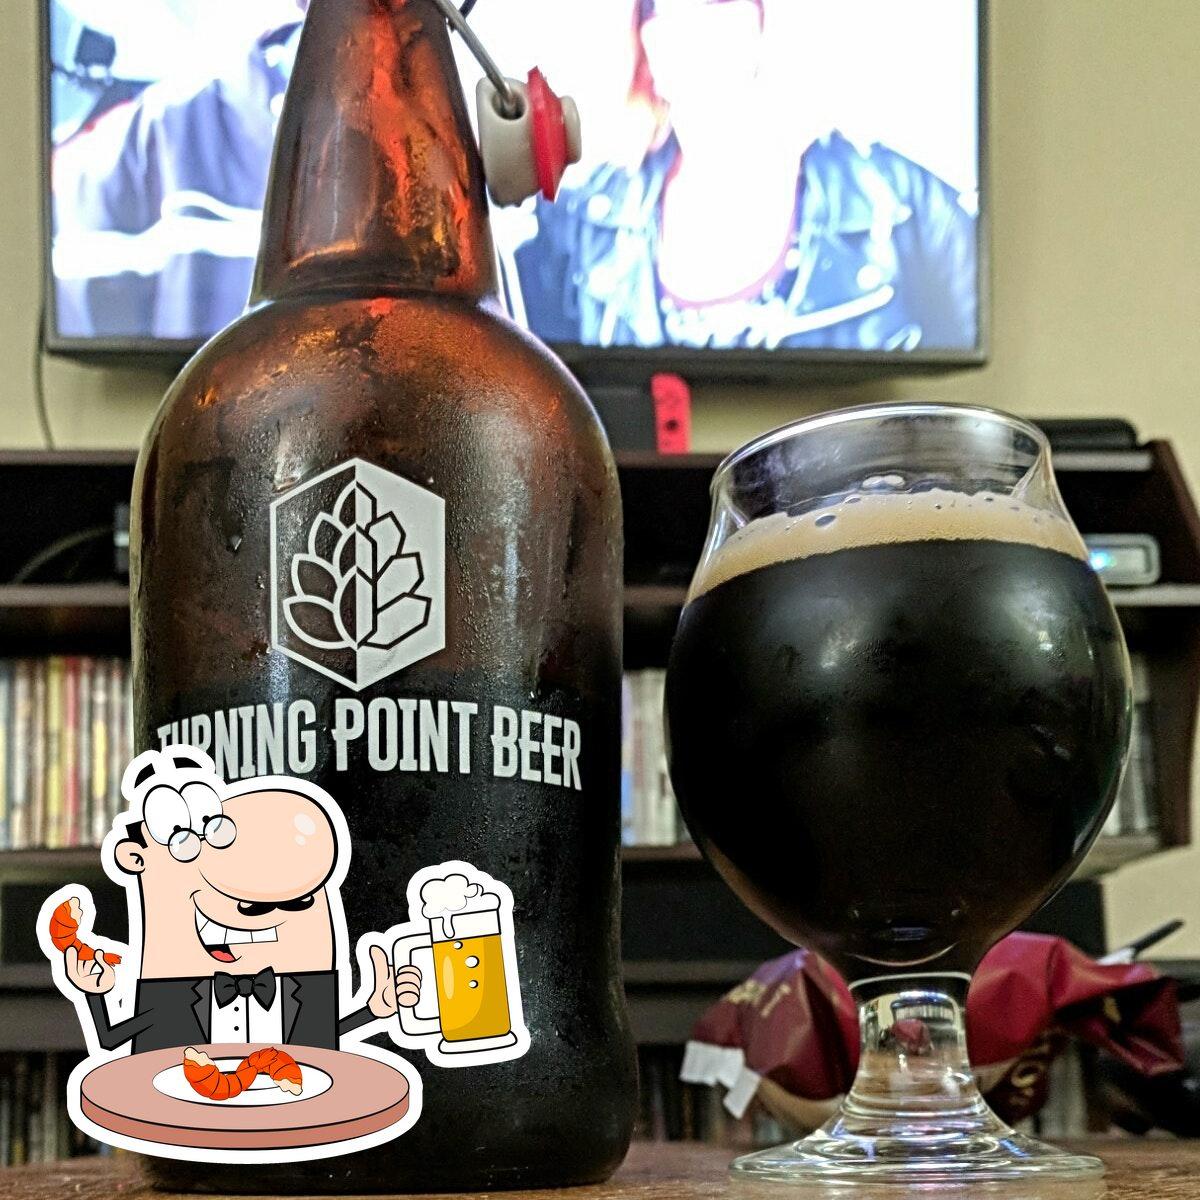 Tómate una cerveza al final del día